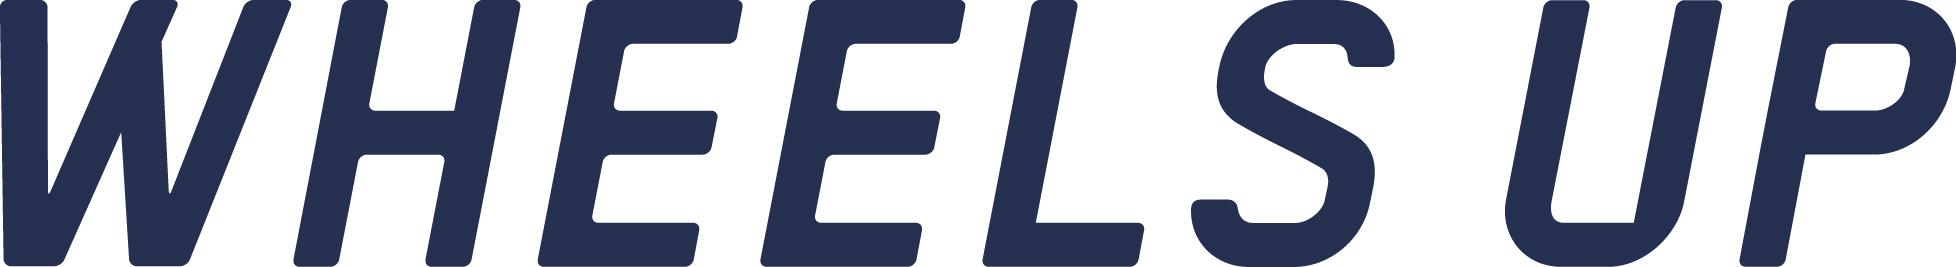 Wheels_Up_Logo.jpg